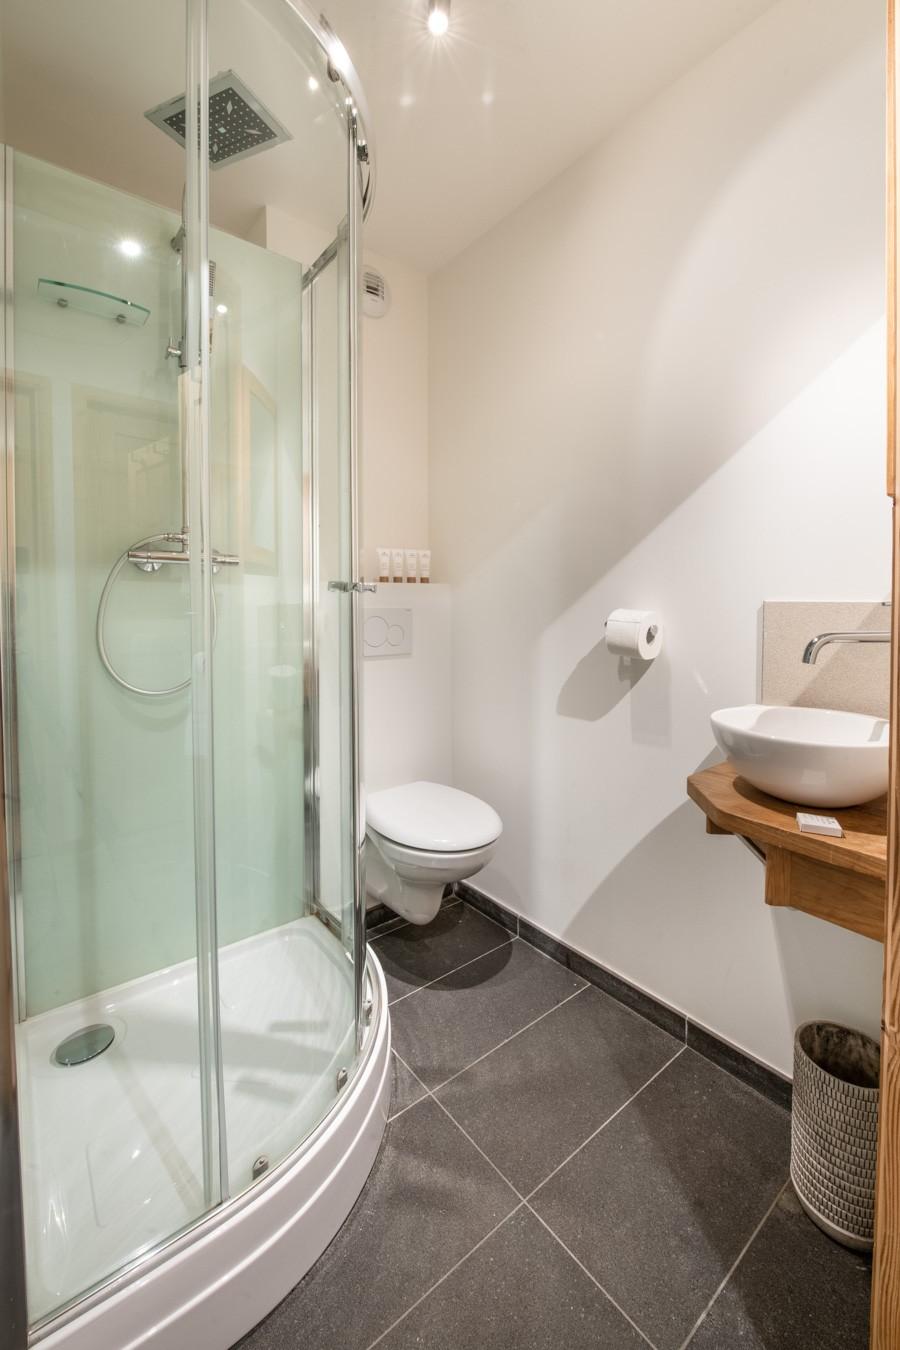 Les Gets Luxury Rental Appartment Anrelle Bathroom